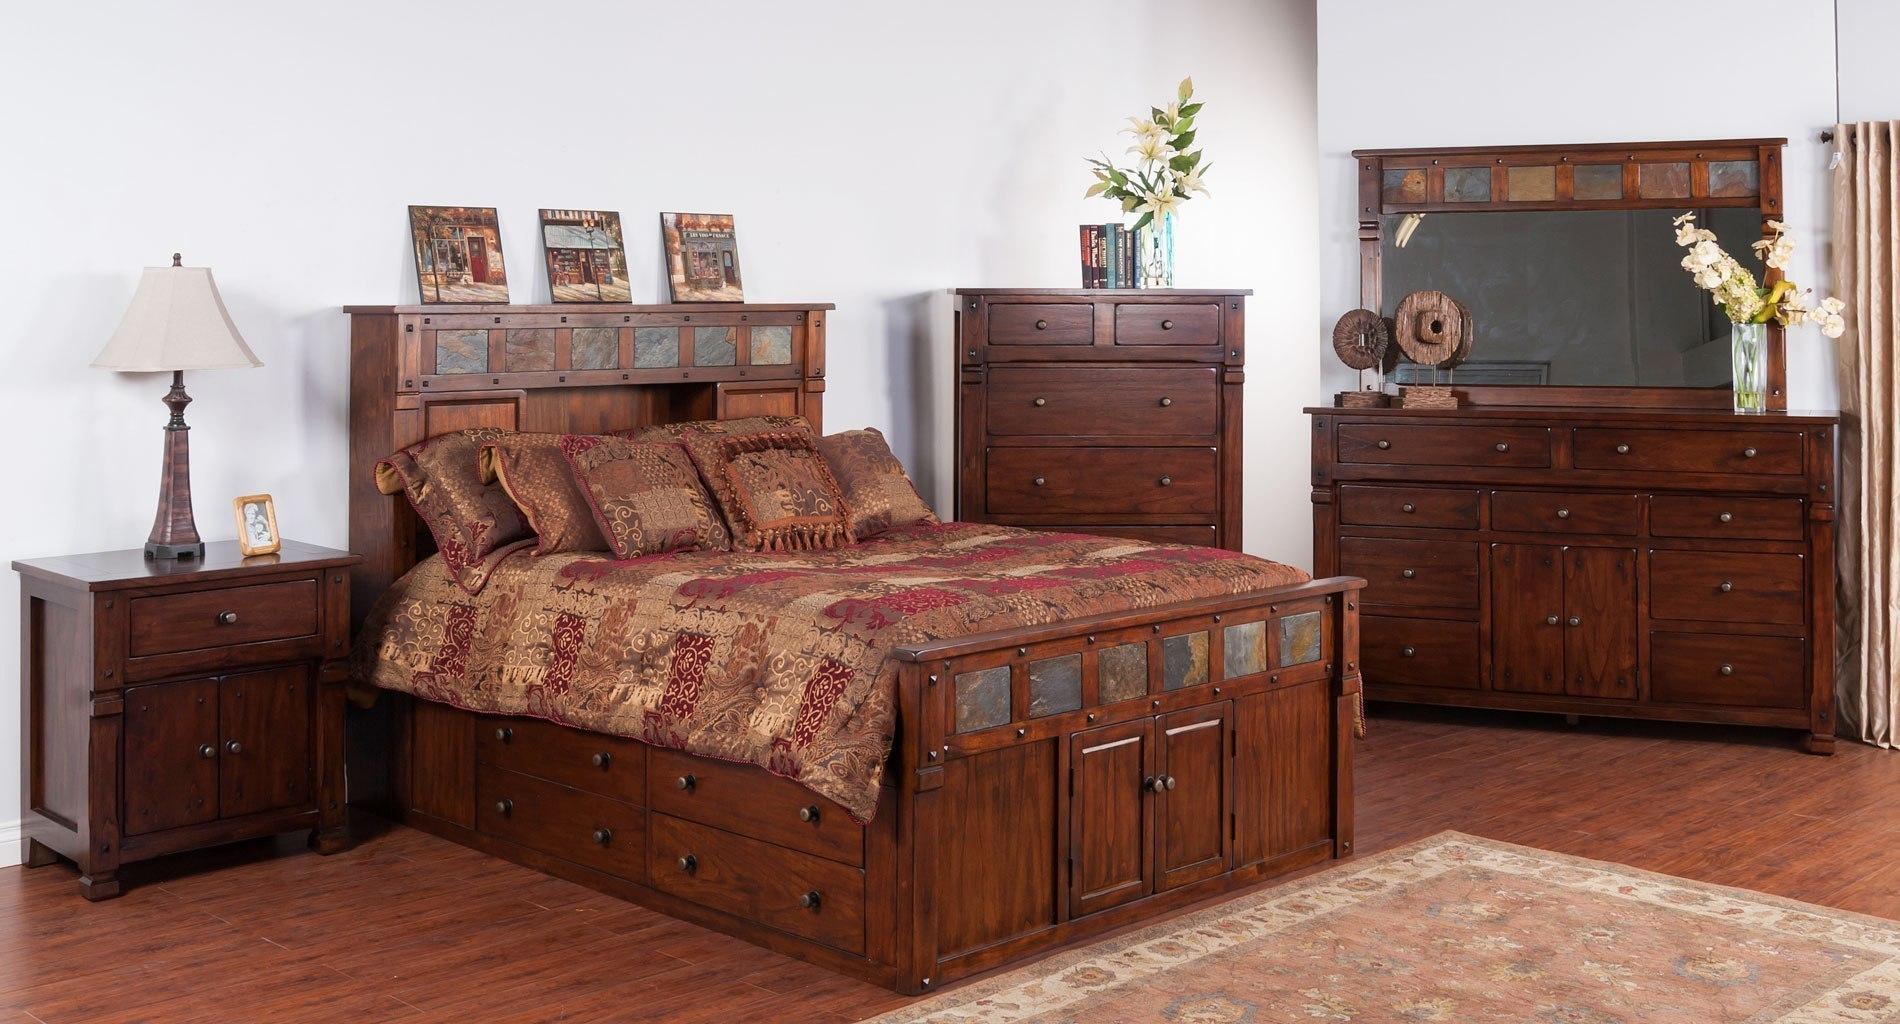 Santa Fe Bookcase Bedroom Set